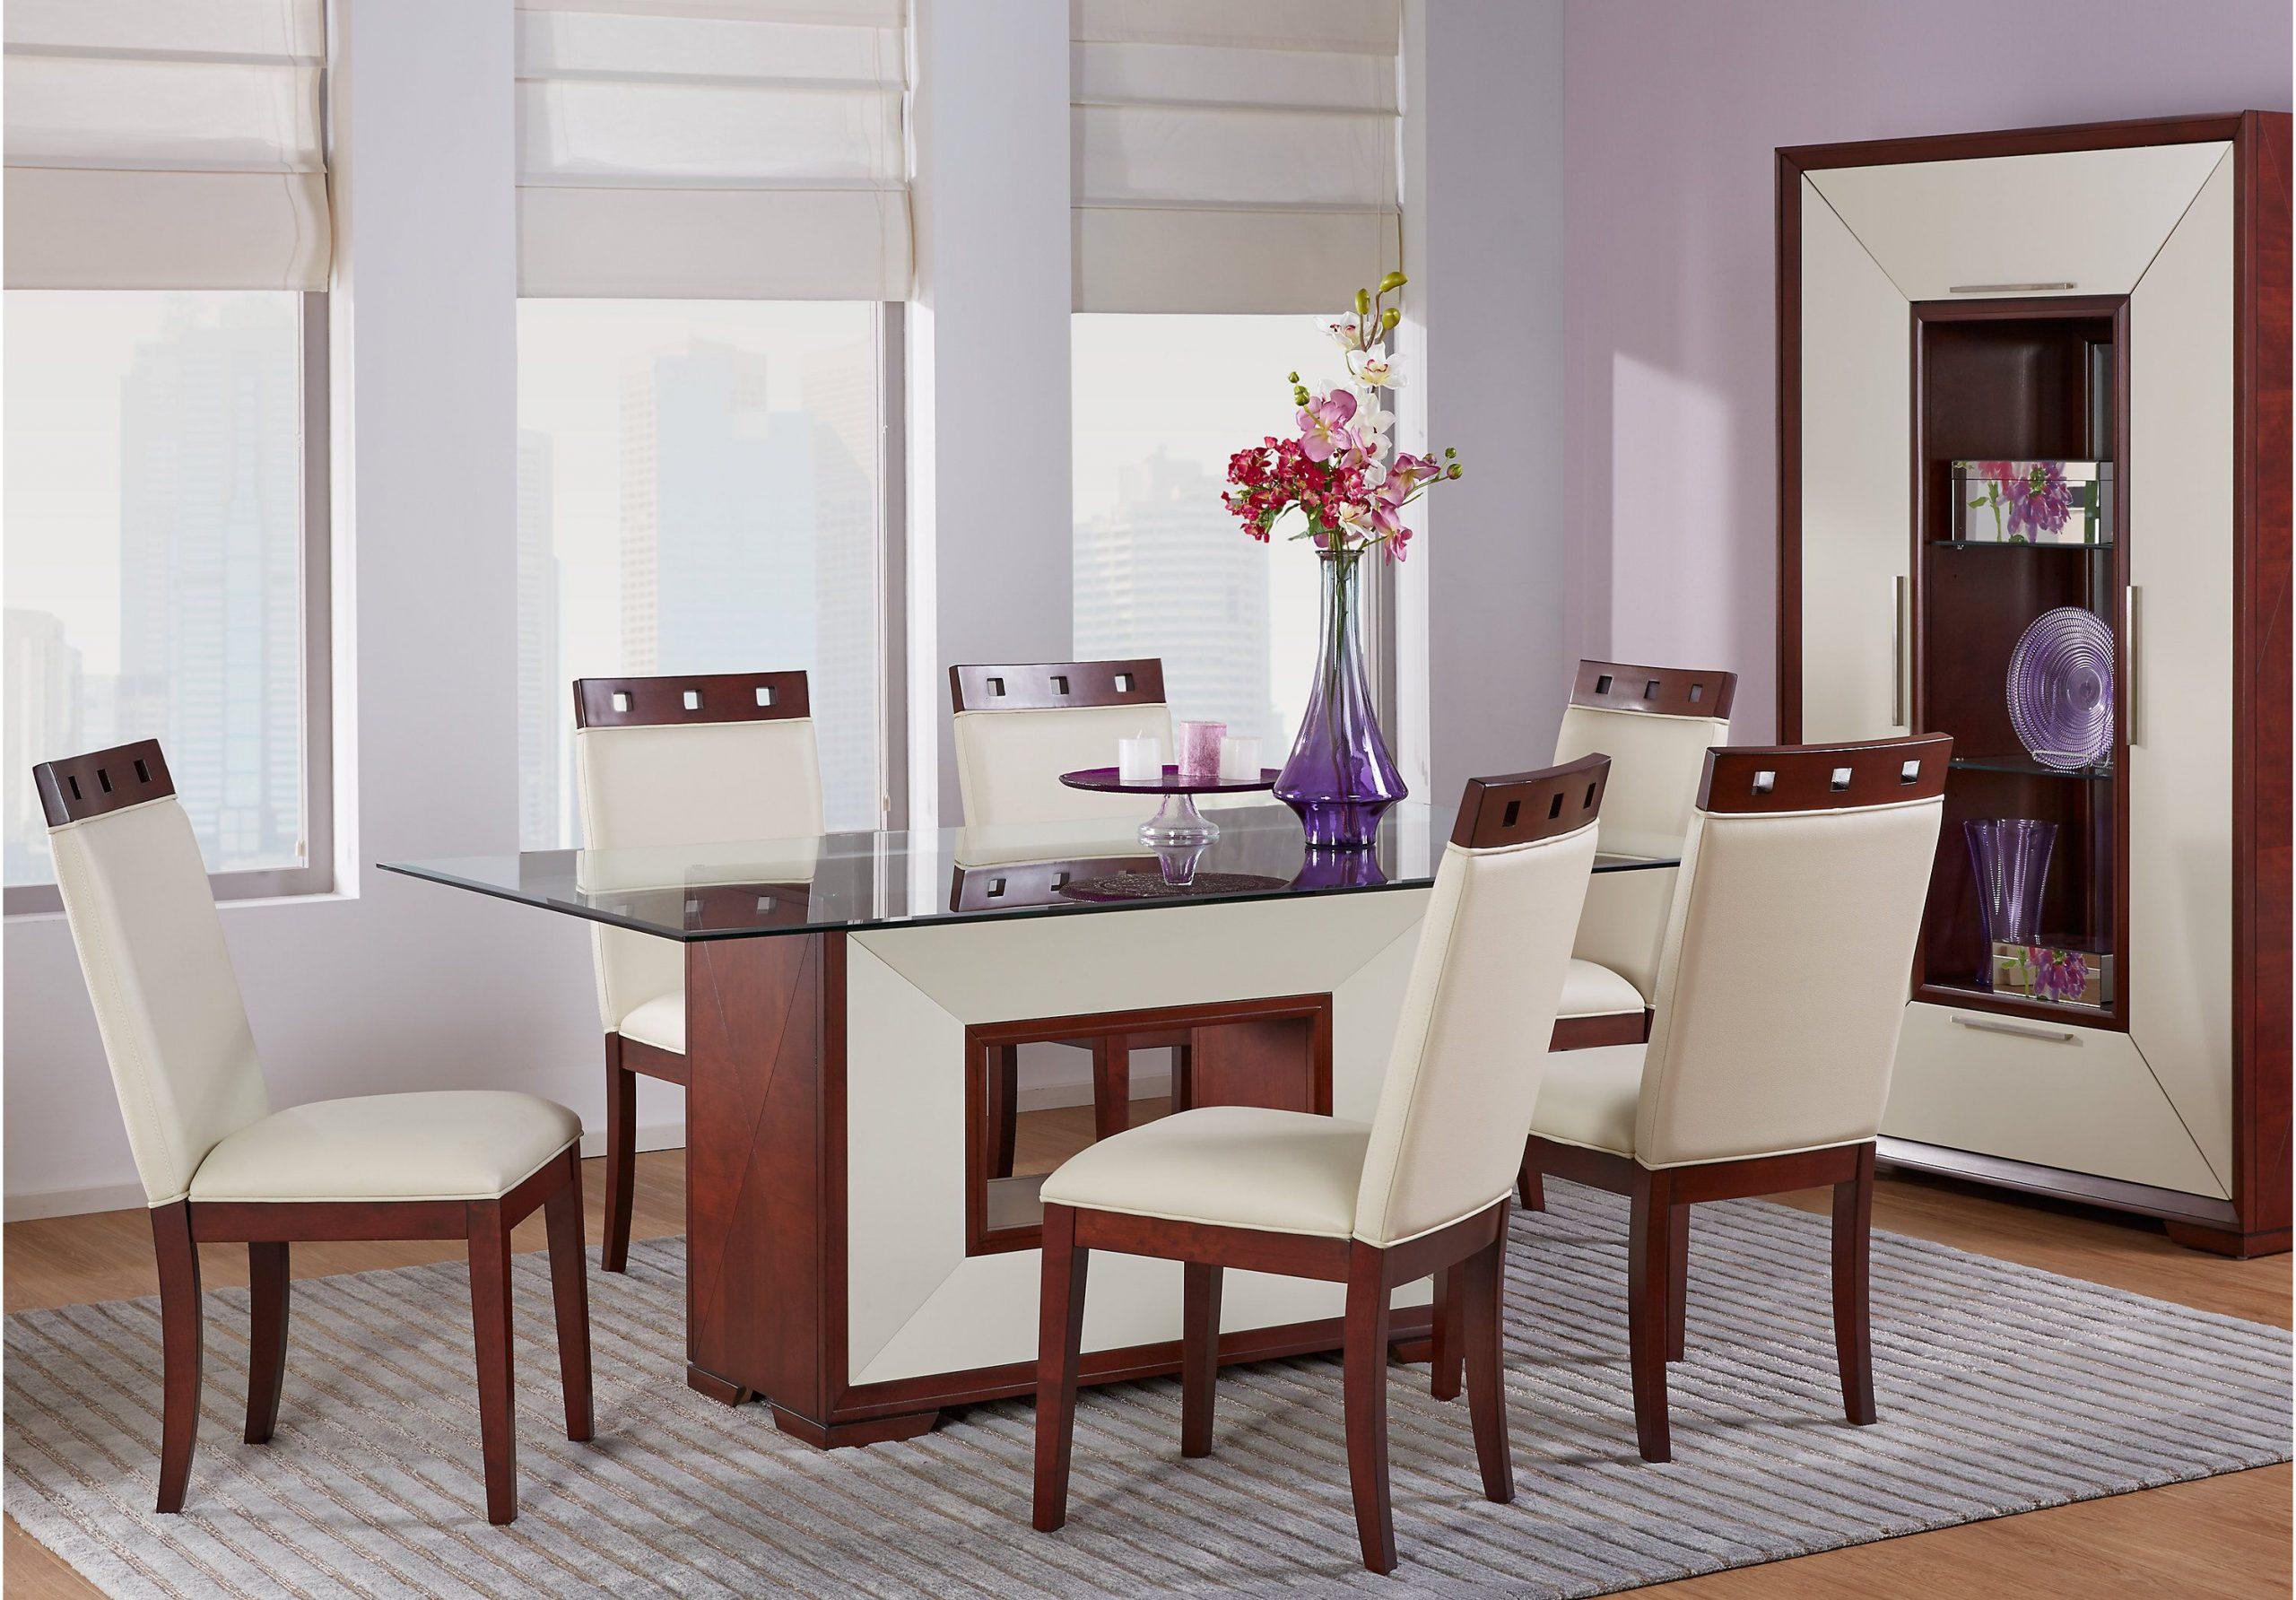 Sofia Vergara Savona Ivory 5 Pc Rectangle Dining Room with Open Bank